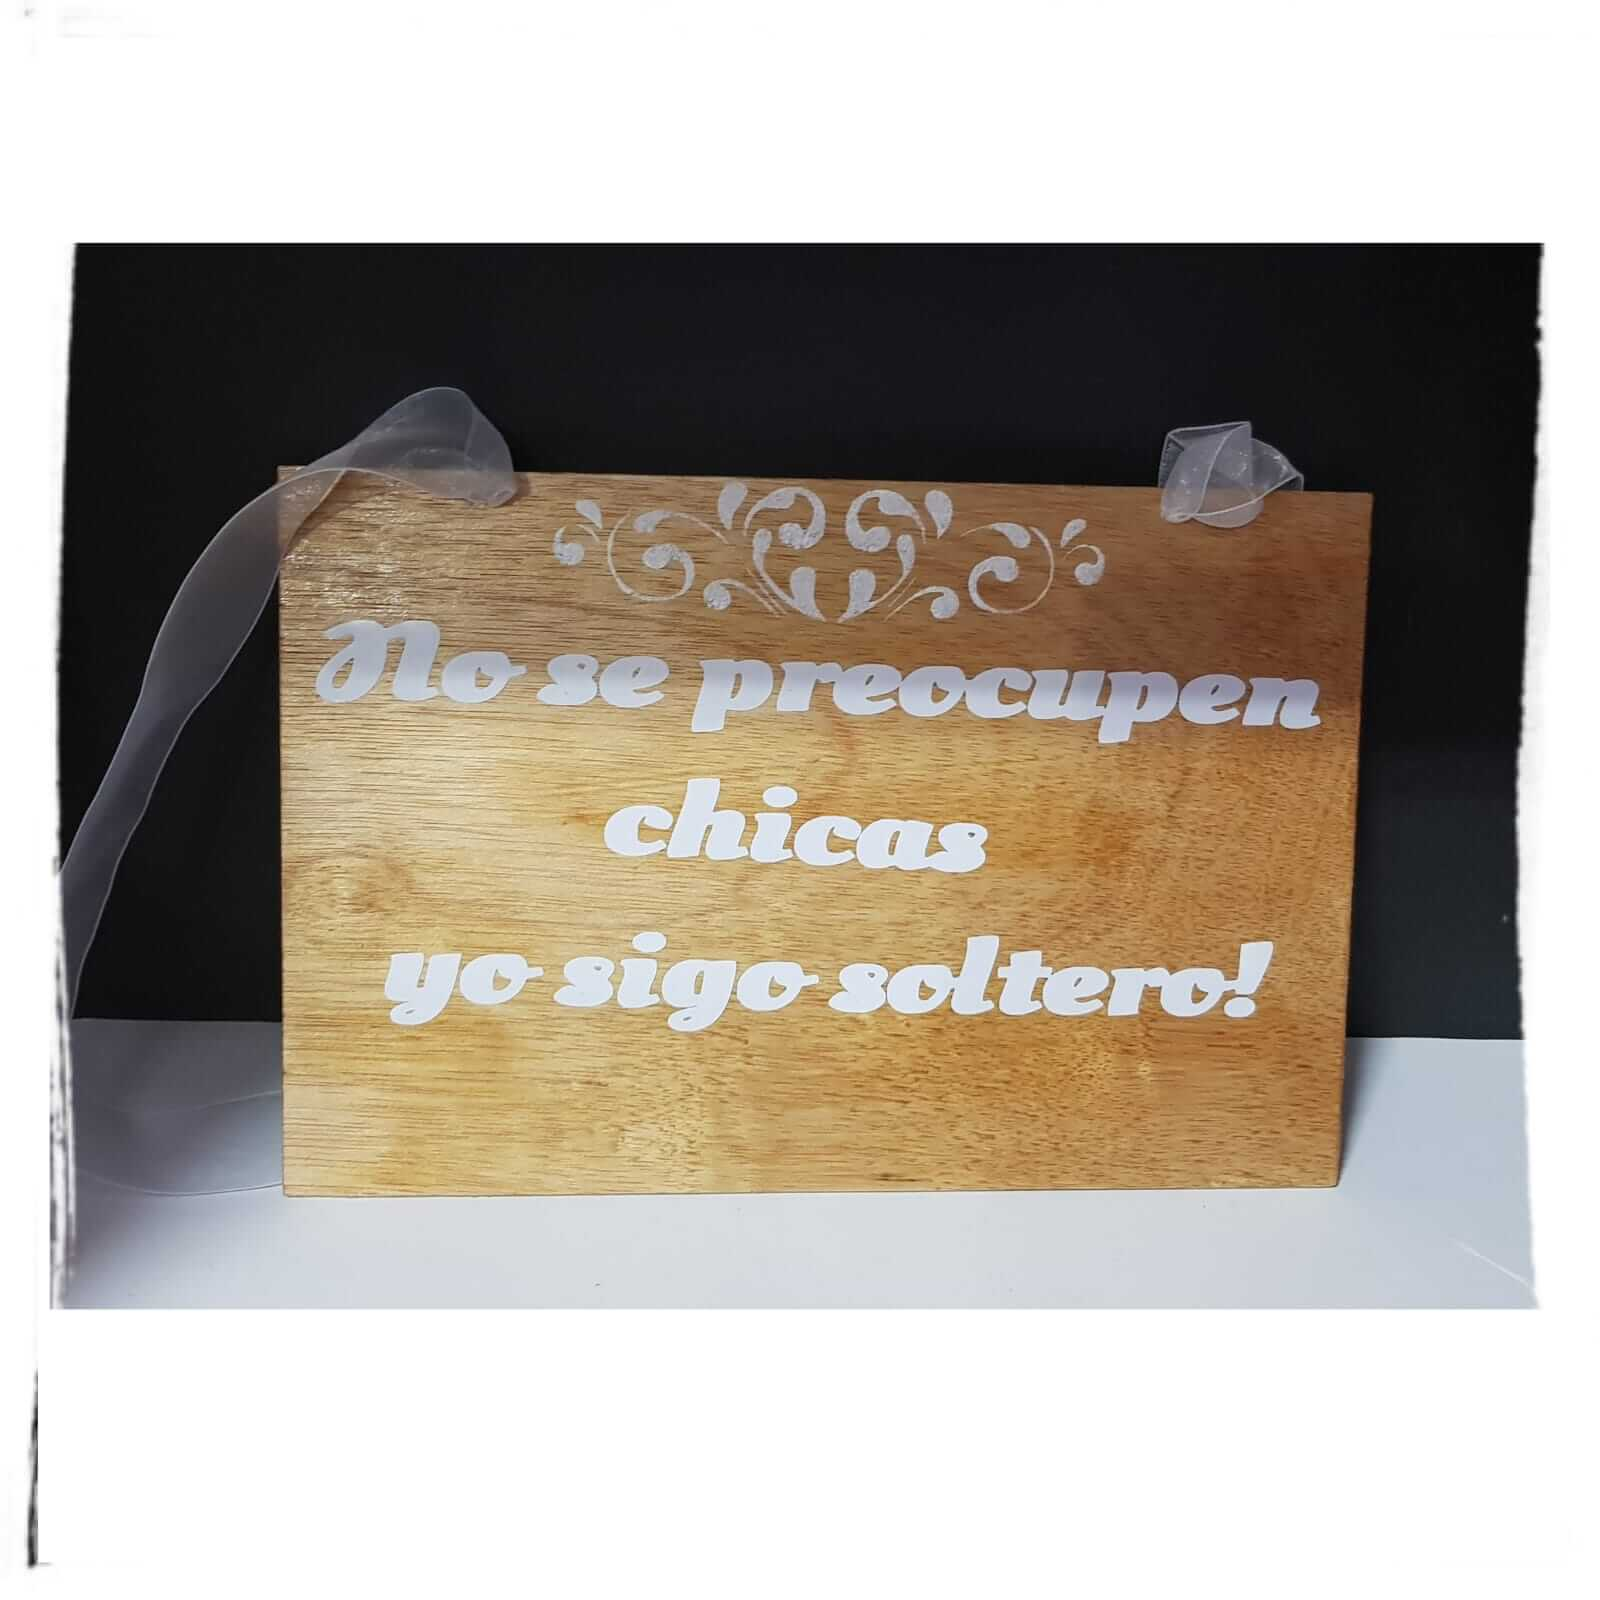 carteles boda carteles boda - carteles boda detalles boda 3 - Carteles boda | detalles boda